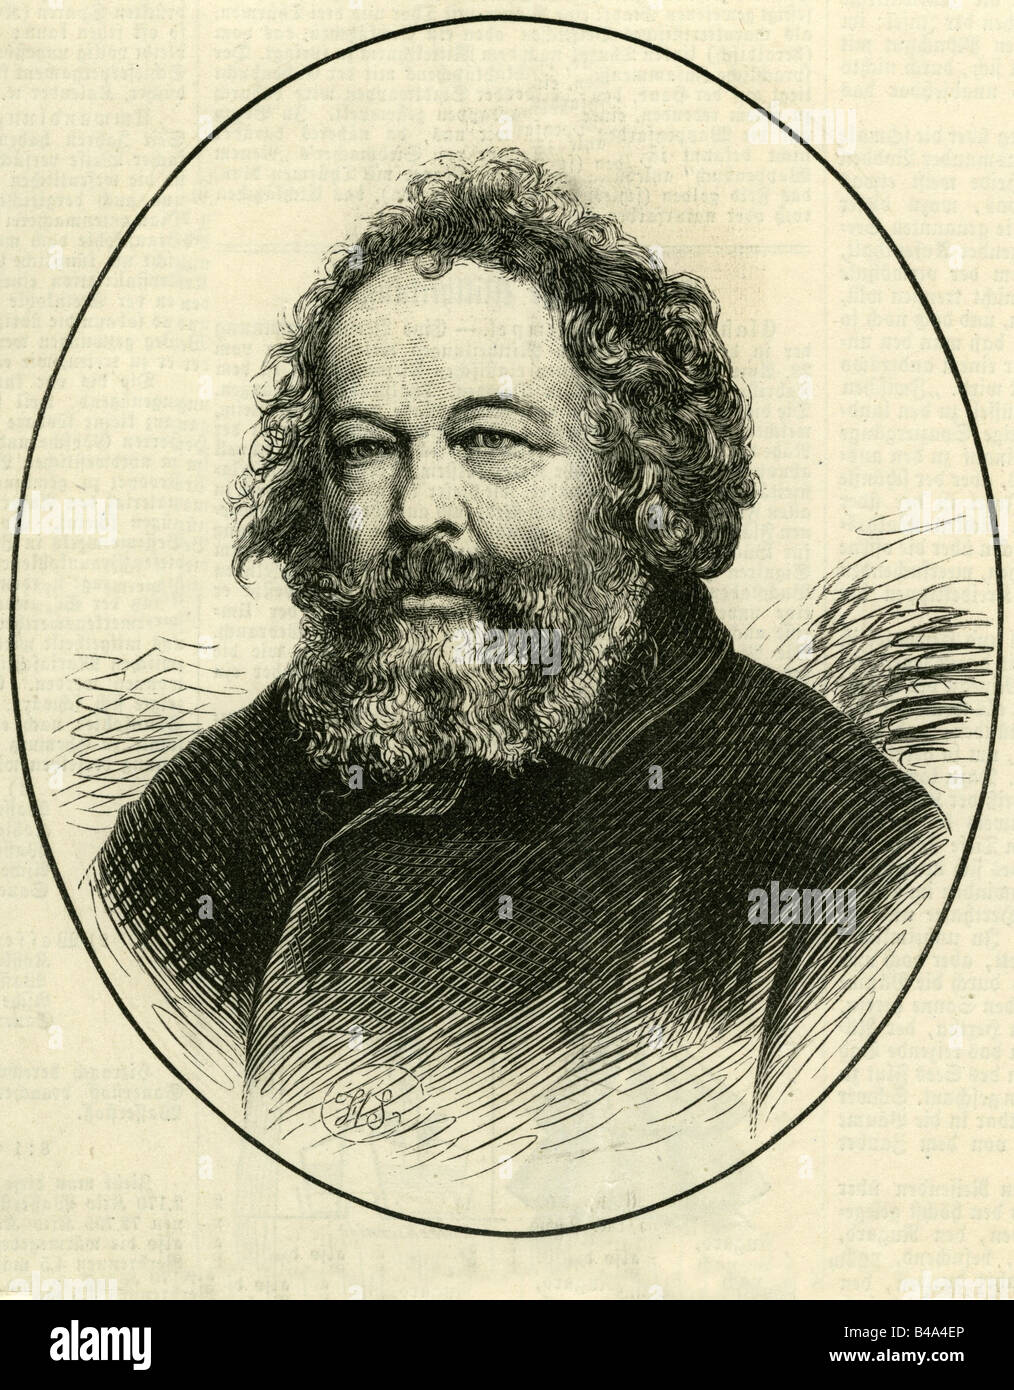 Bakunin, Mikhail Alexandrovich, 18.5.1814 - 1.7.1876, Russian revolutionary, portrait, engraving, 1876, , Additional Stock Photo